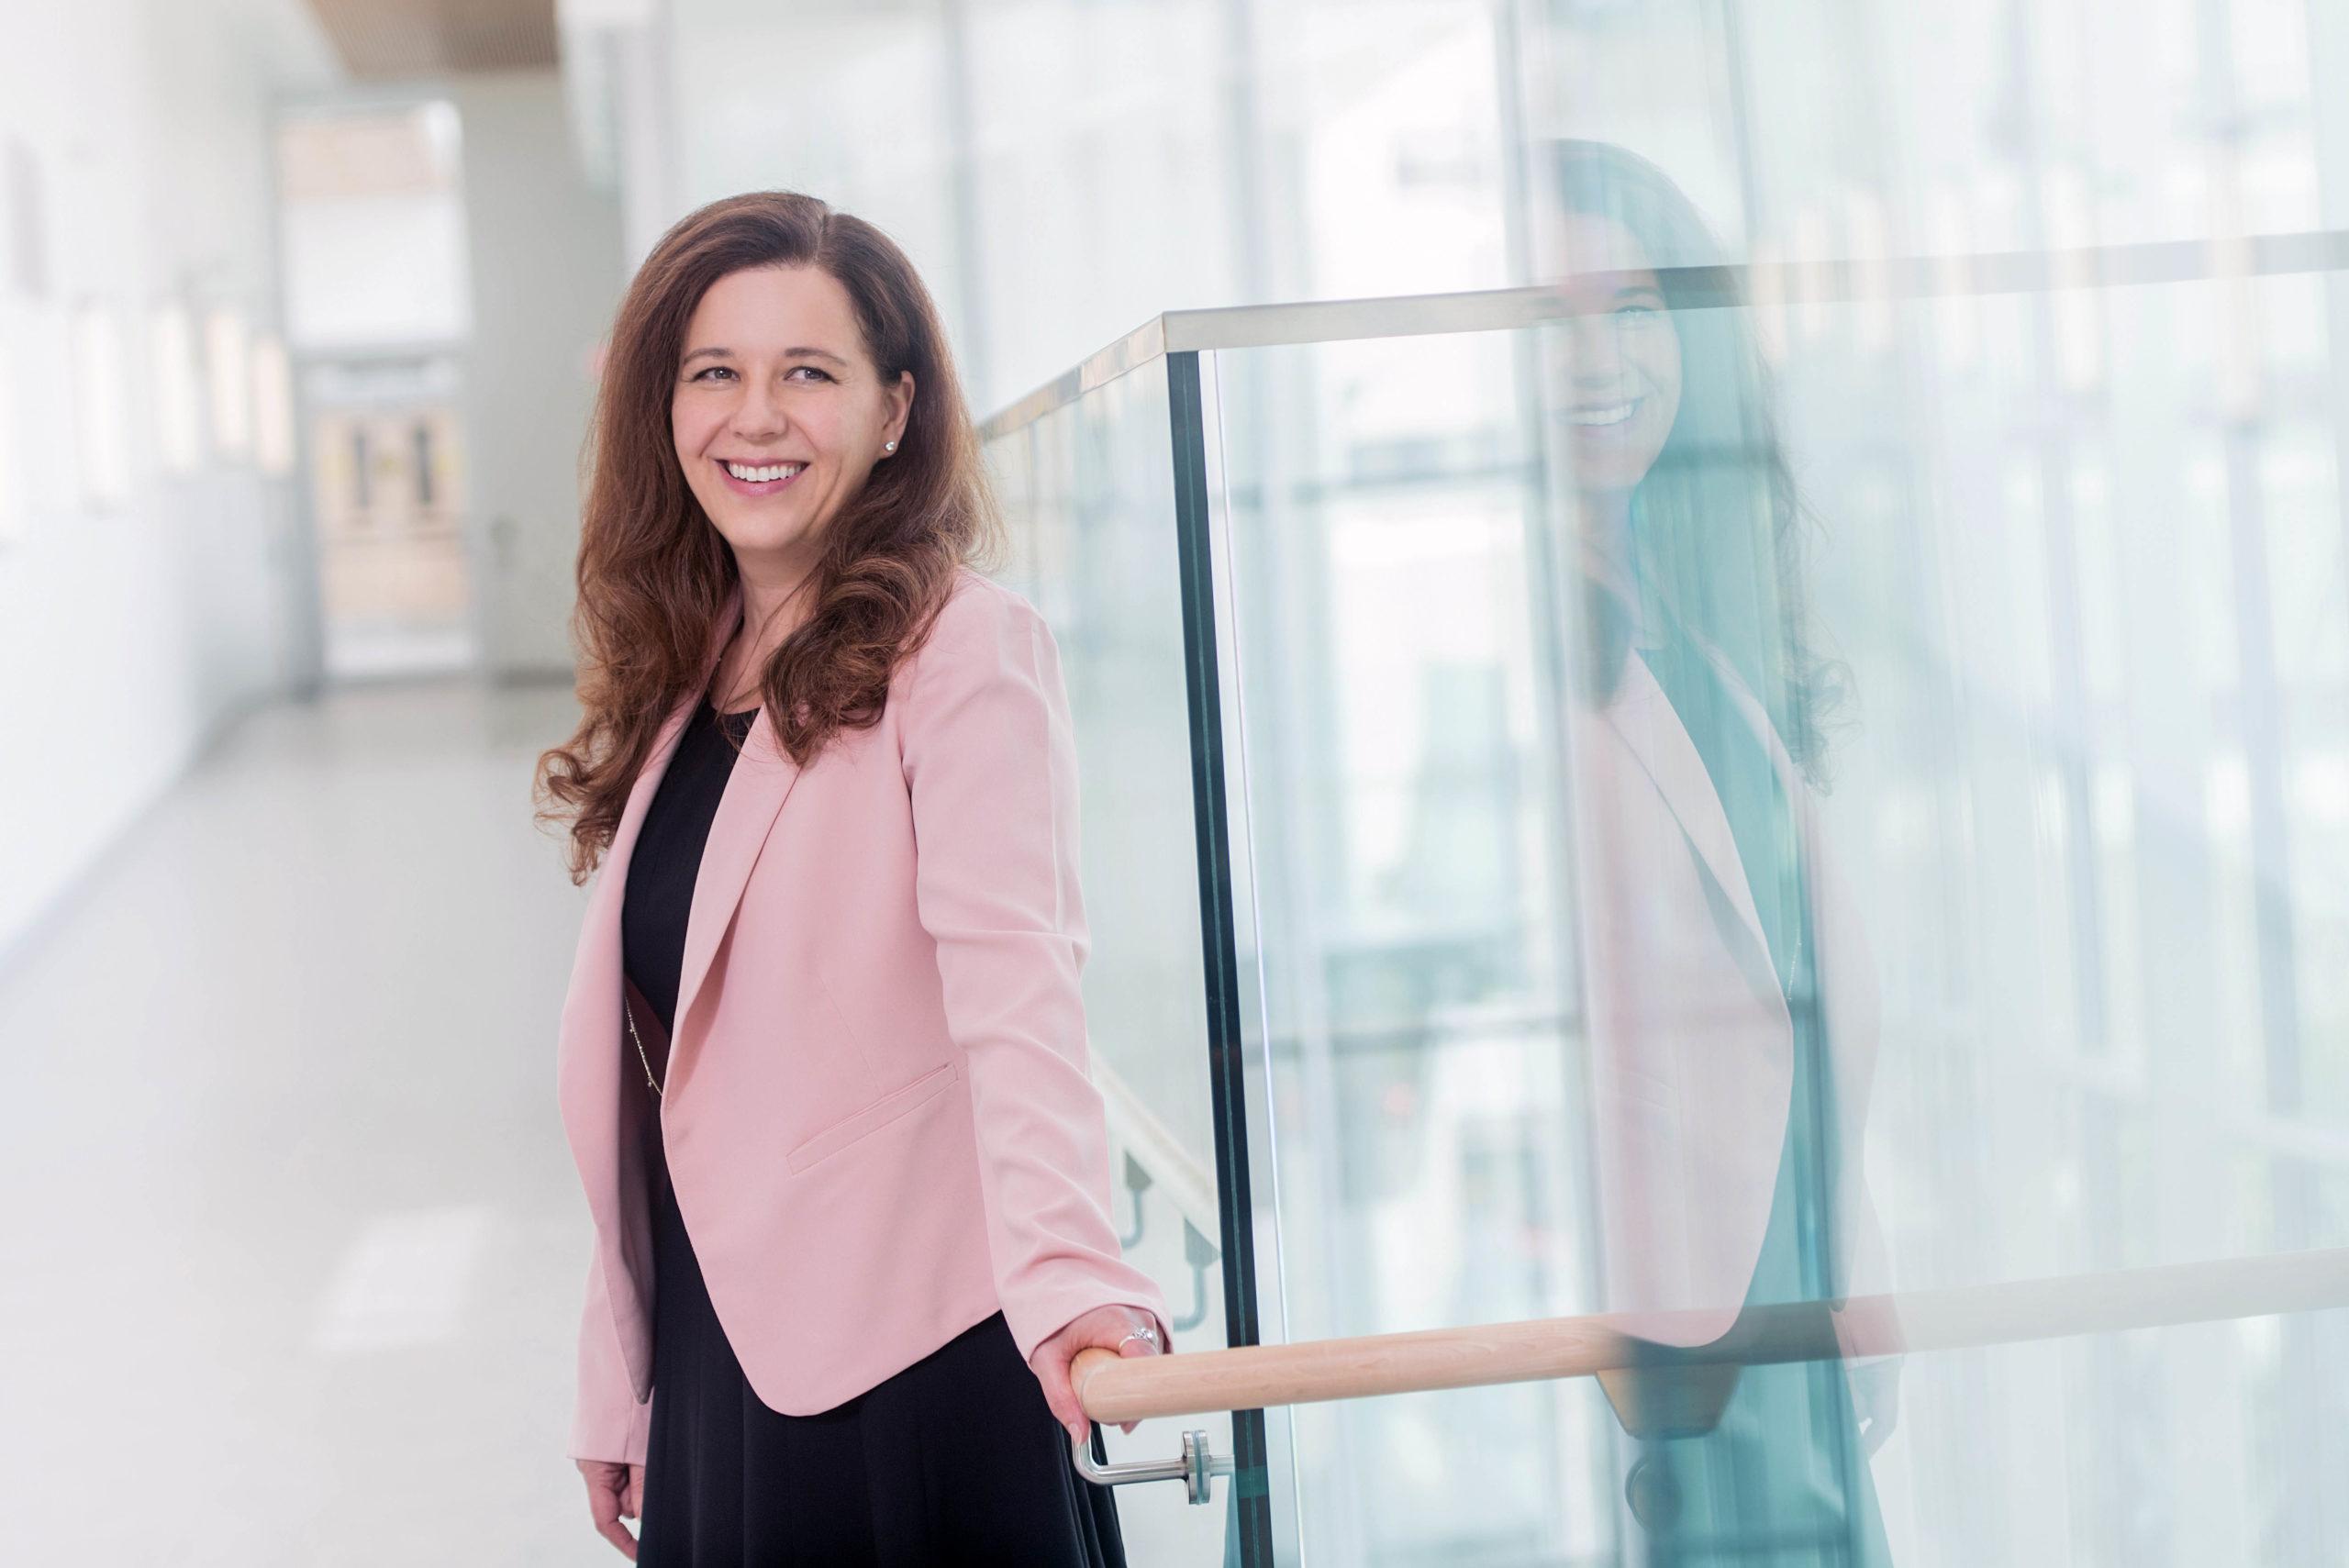 Graduate Program in Neuroscience finds new leader in Dr